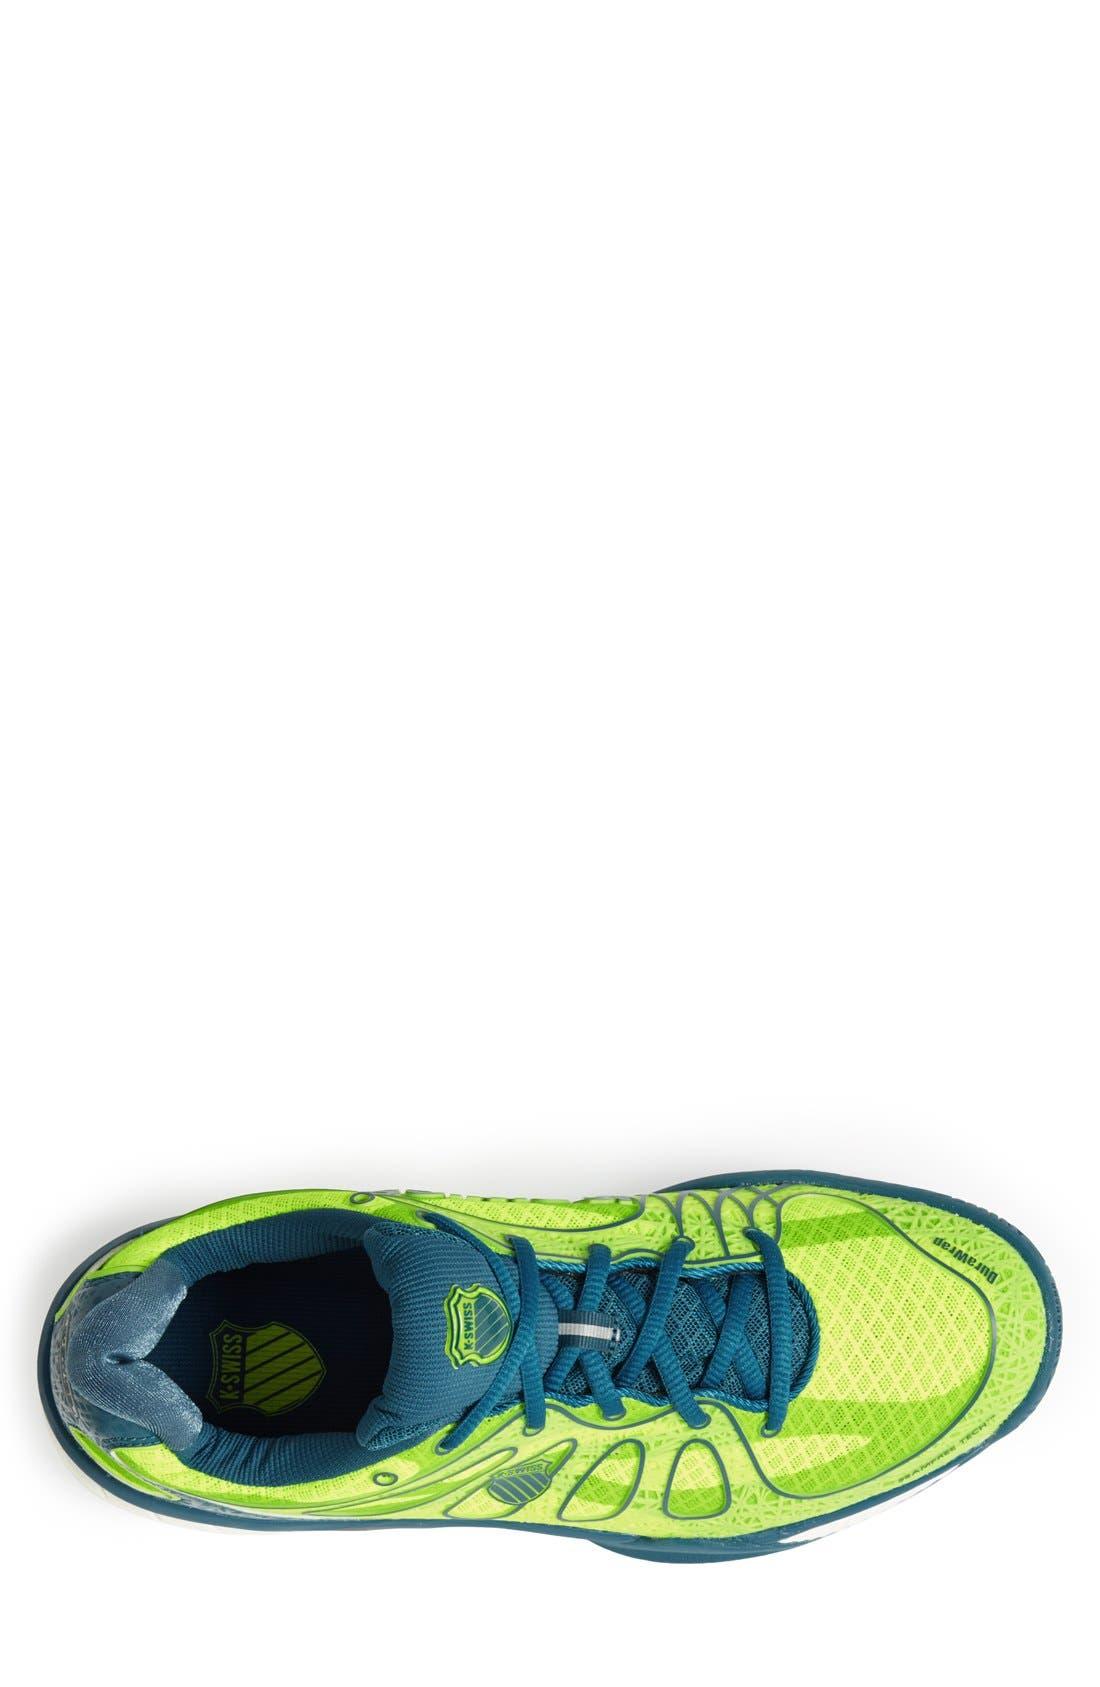 Alternate Image 3  - K-Swiss 'Ultra Express' Tennis Shoe (Men)